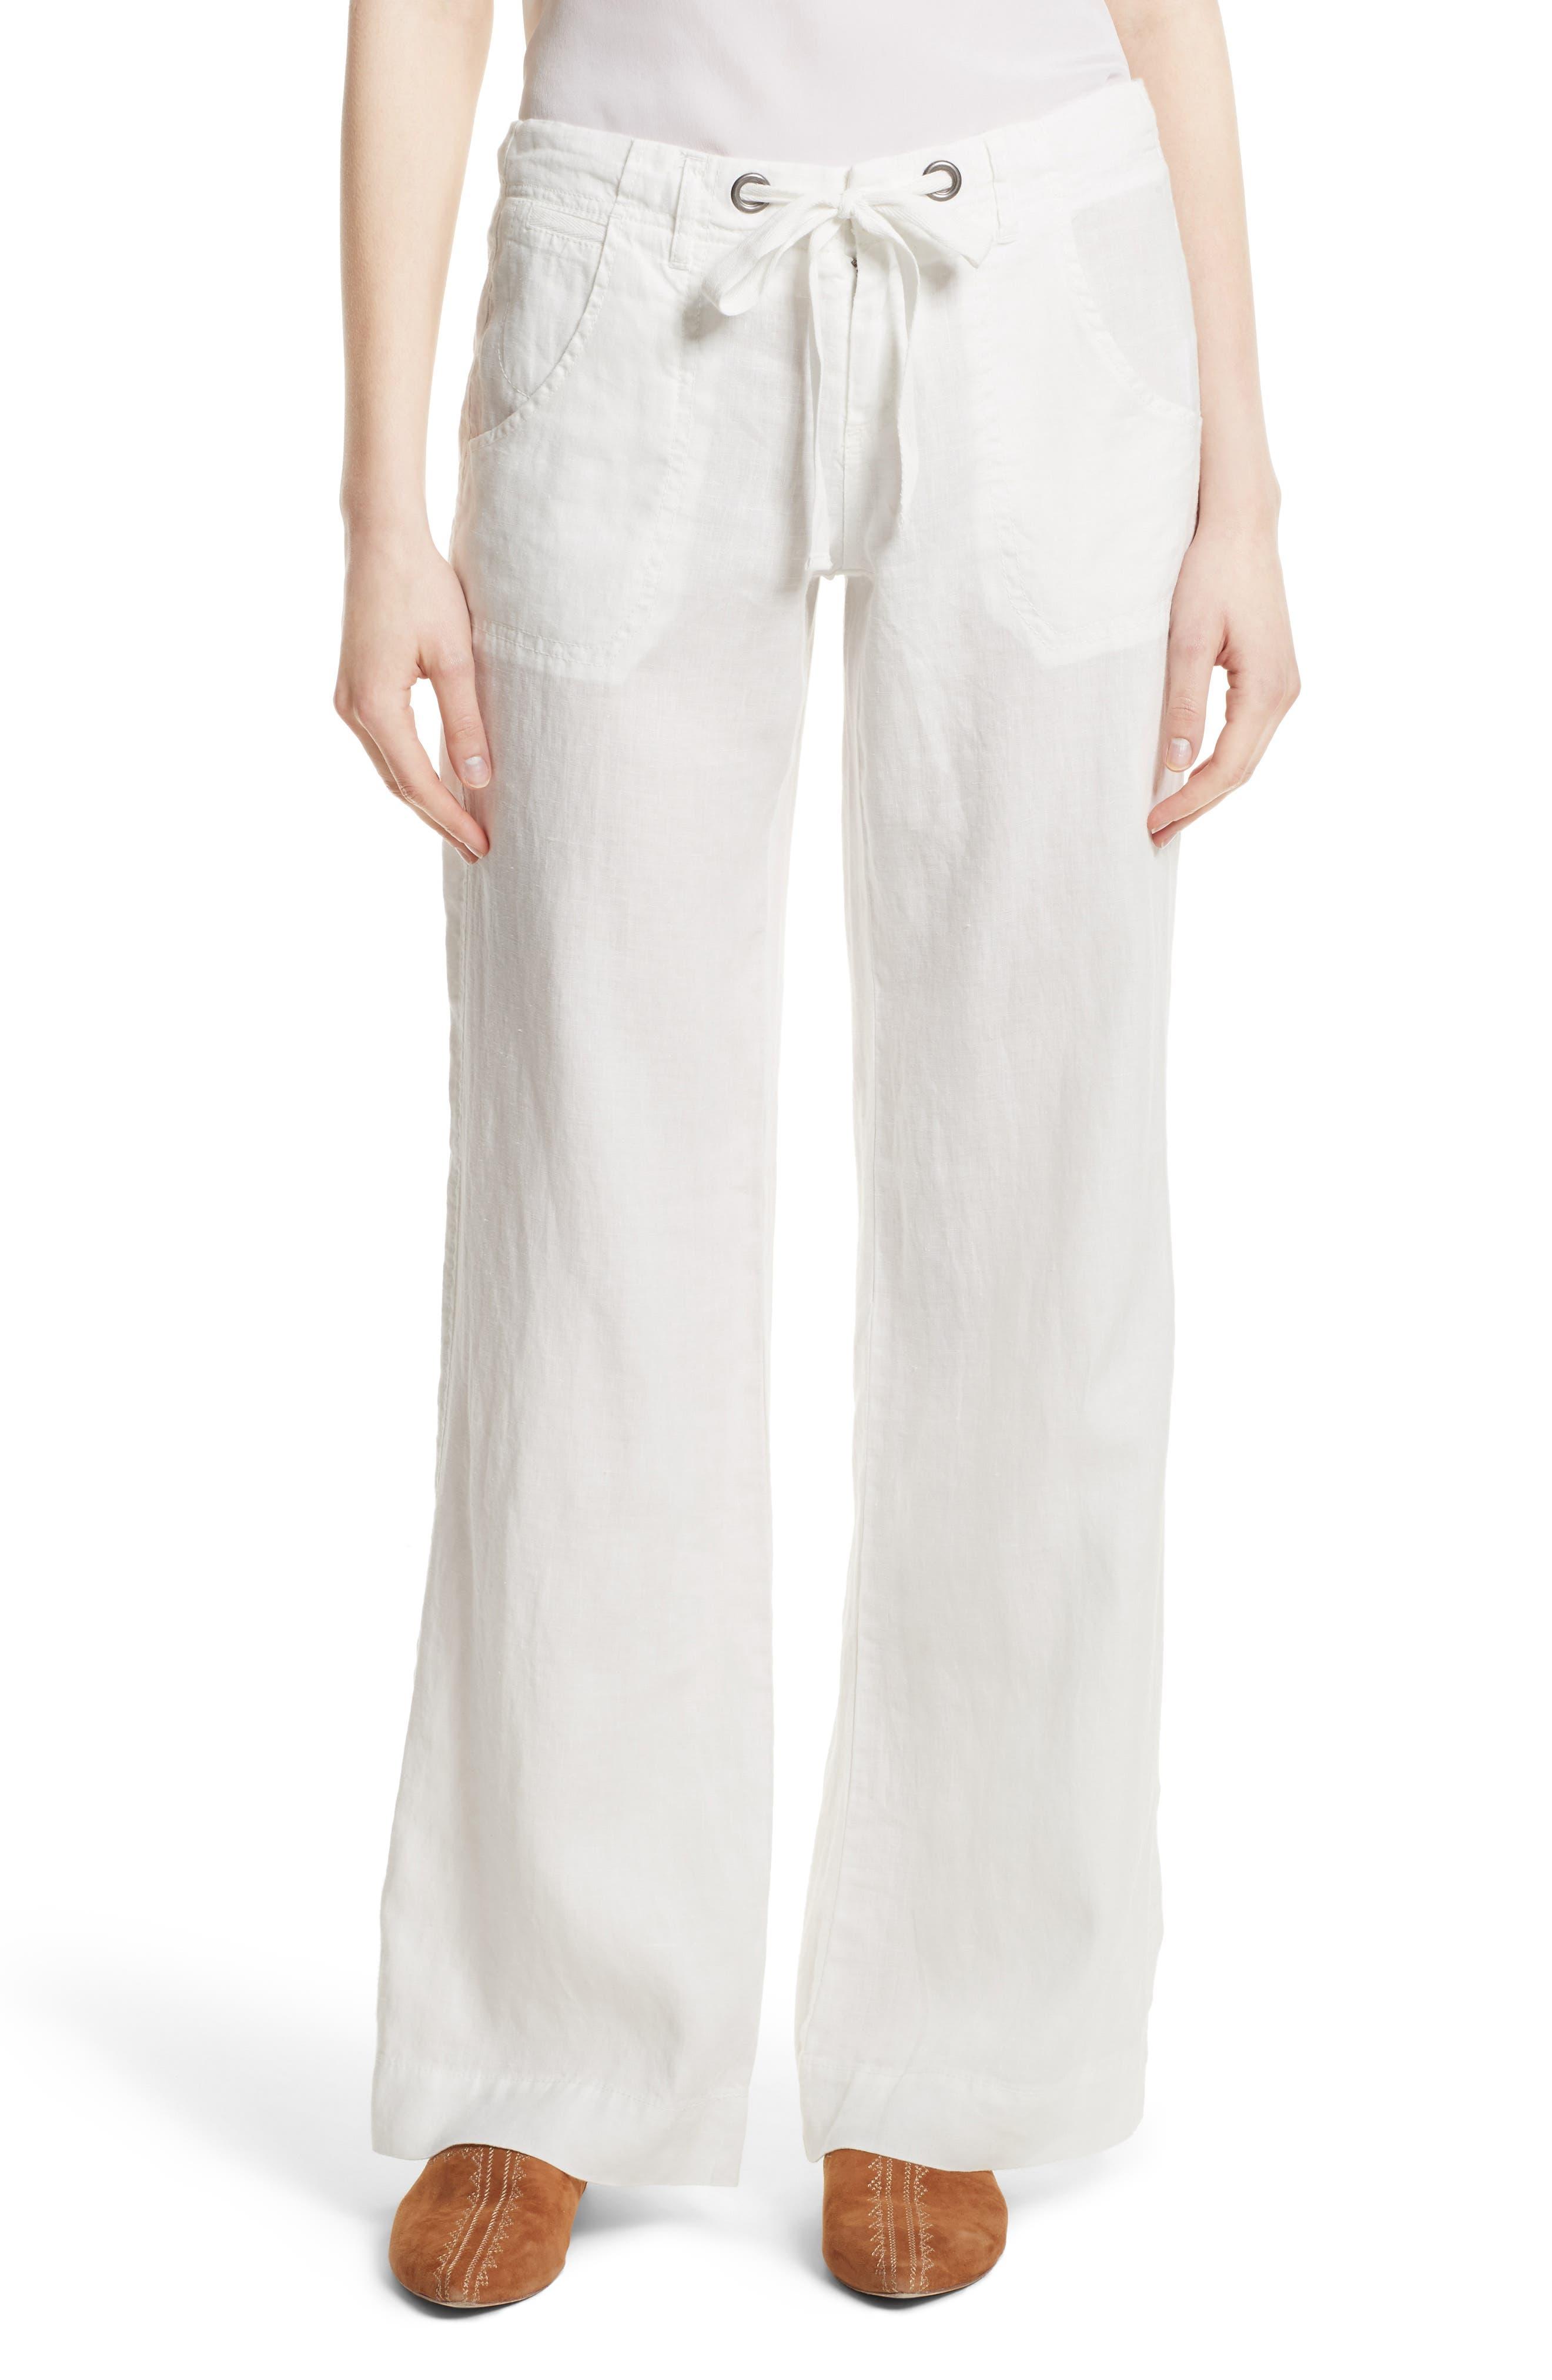 Alternate Image 1 Selected - Joie Wide Leg Linen Pants